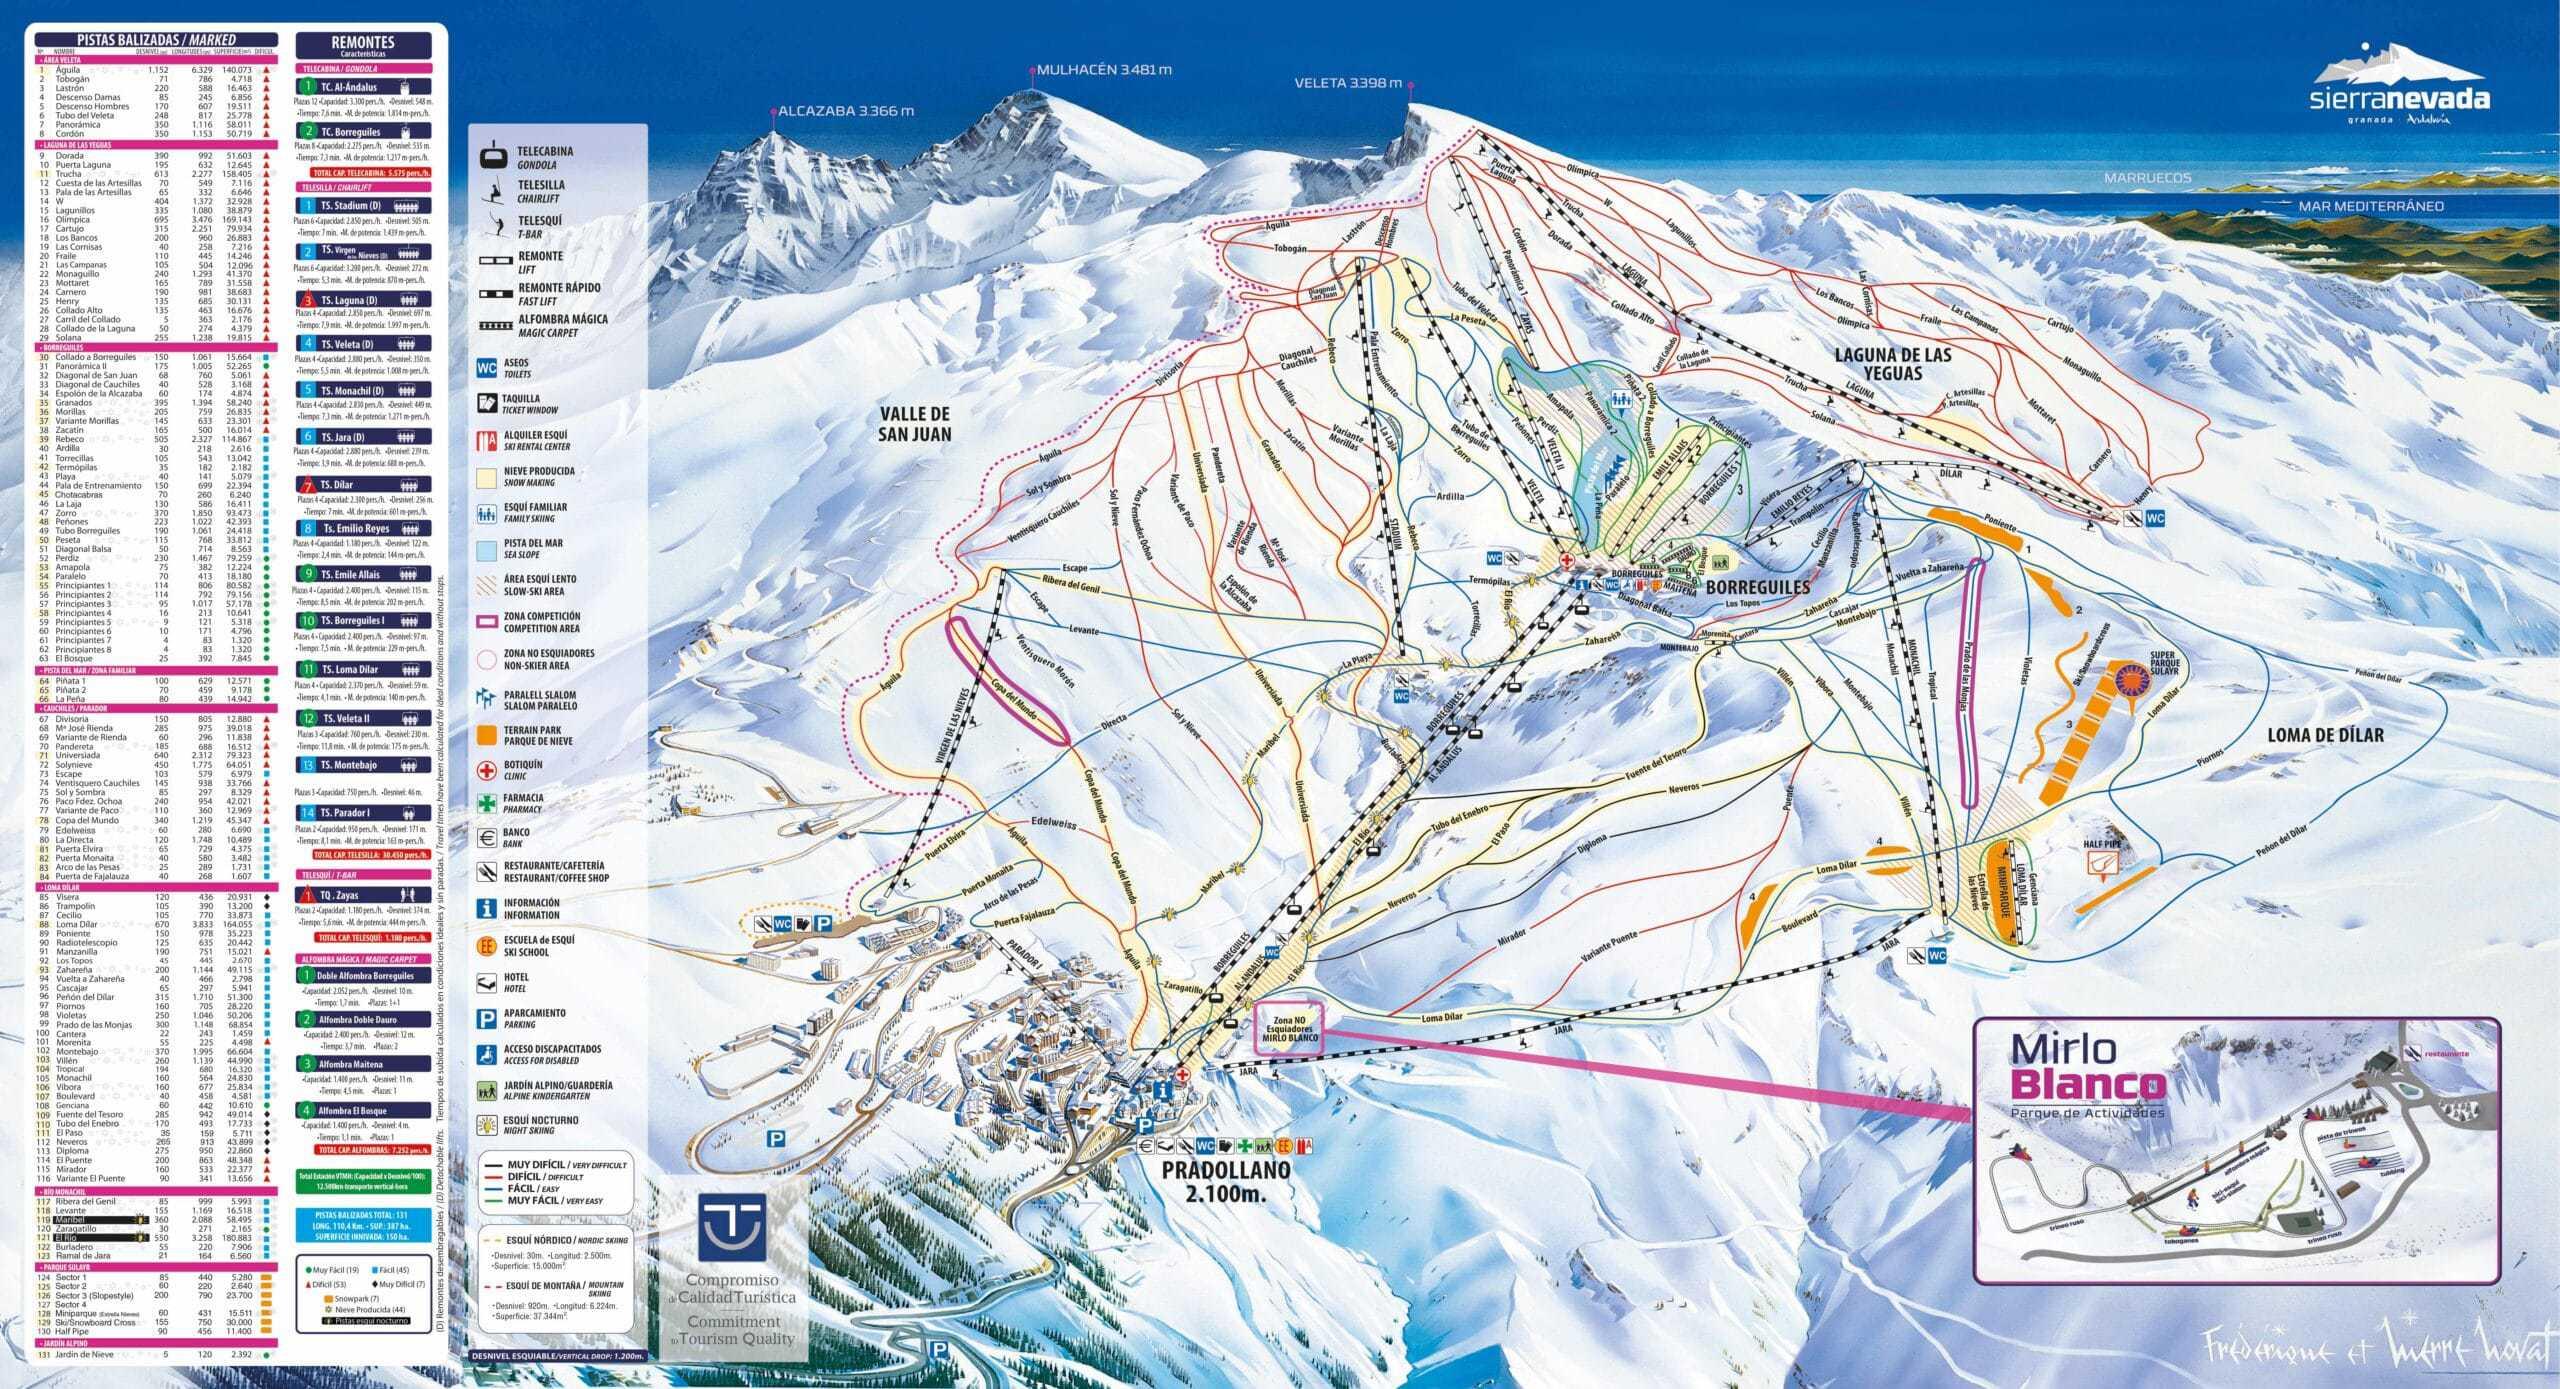 Sierra Nevada Ski pistekort scaled